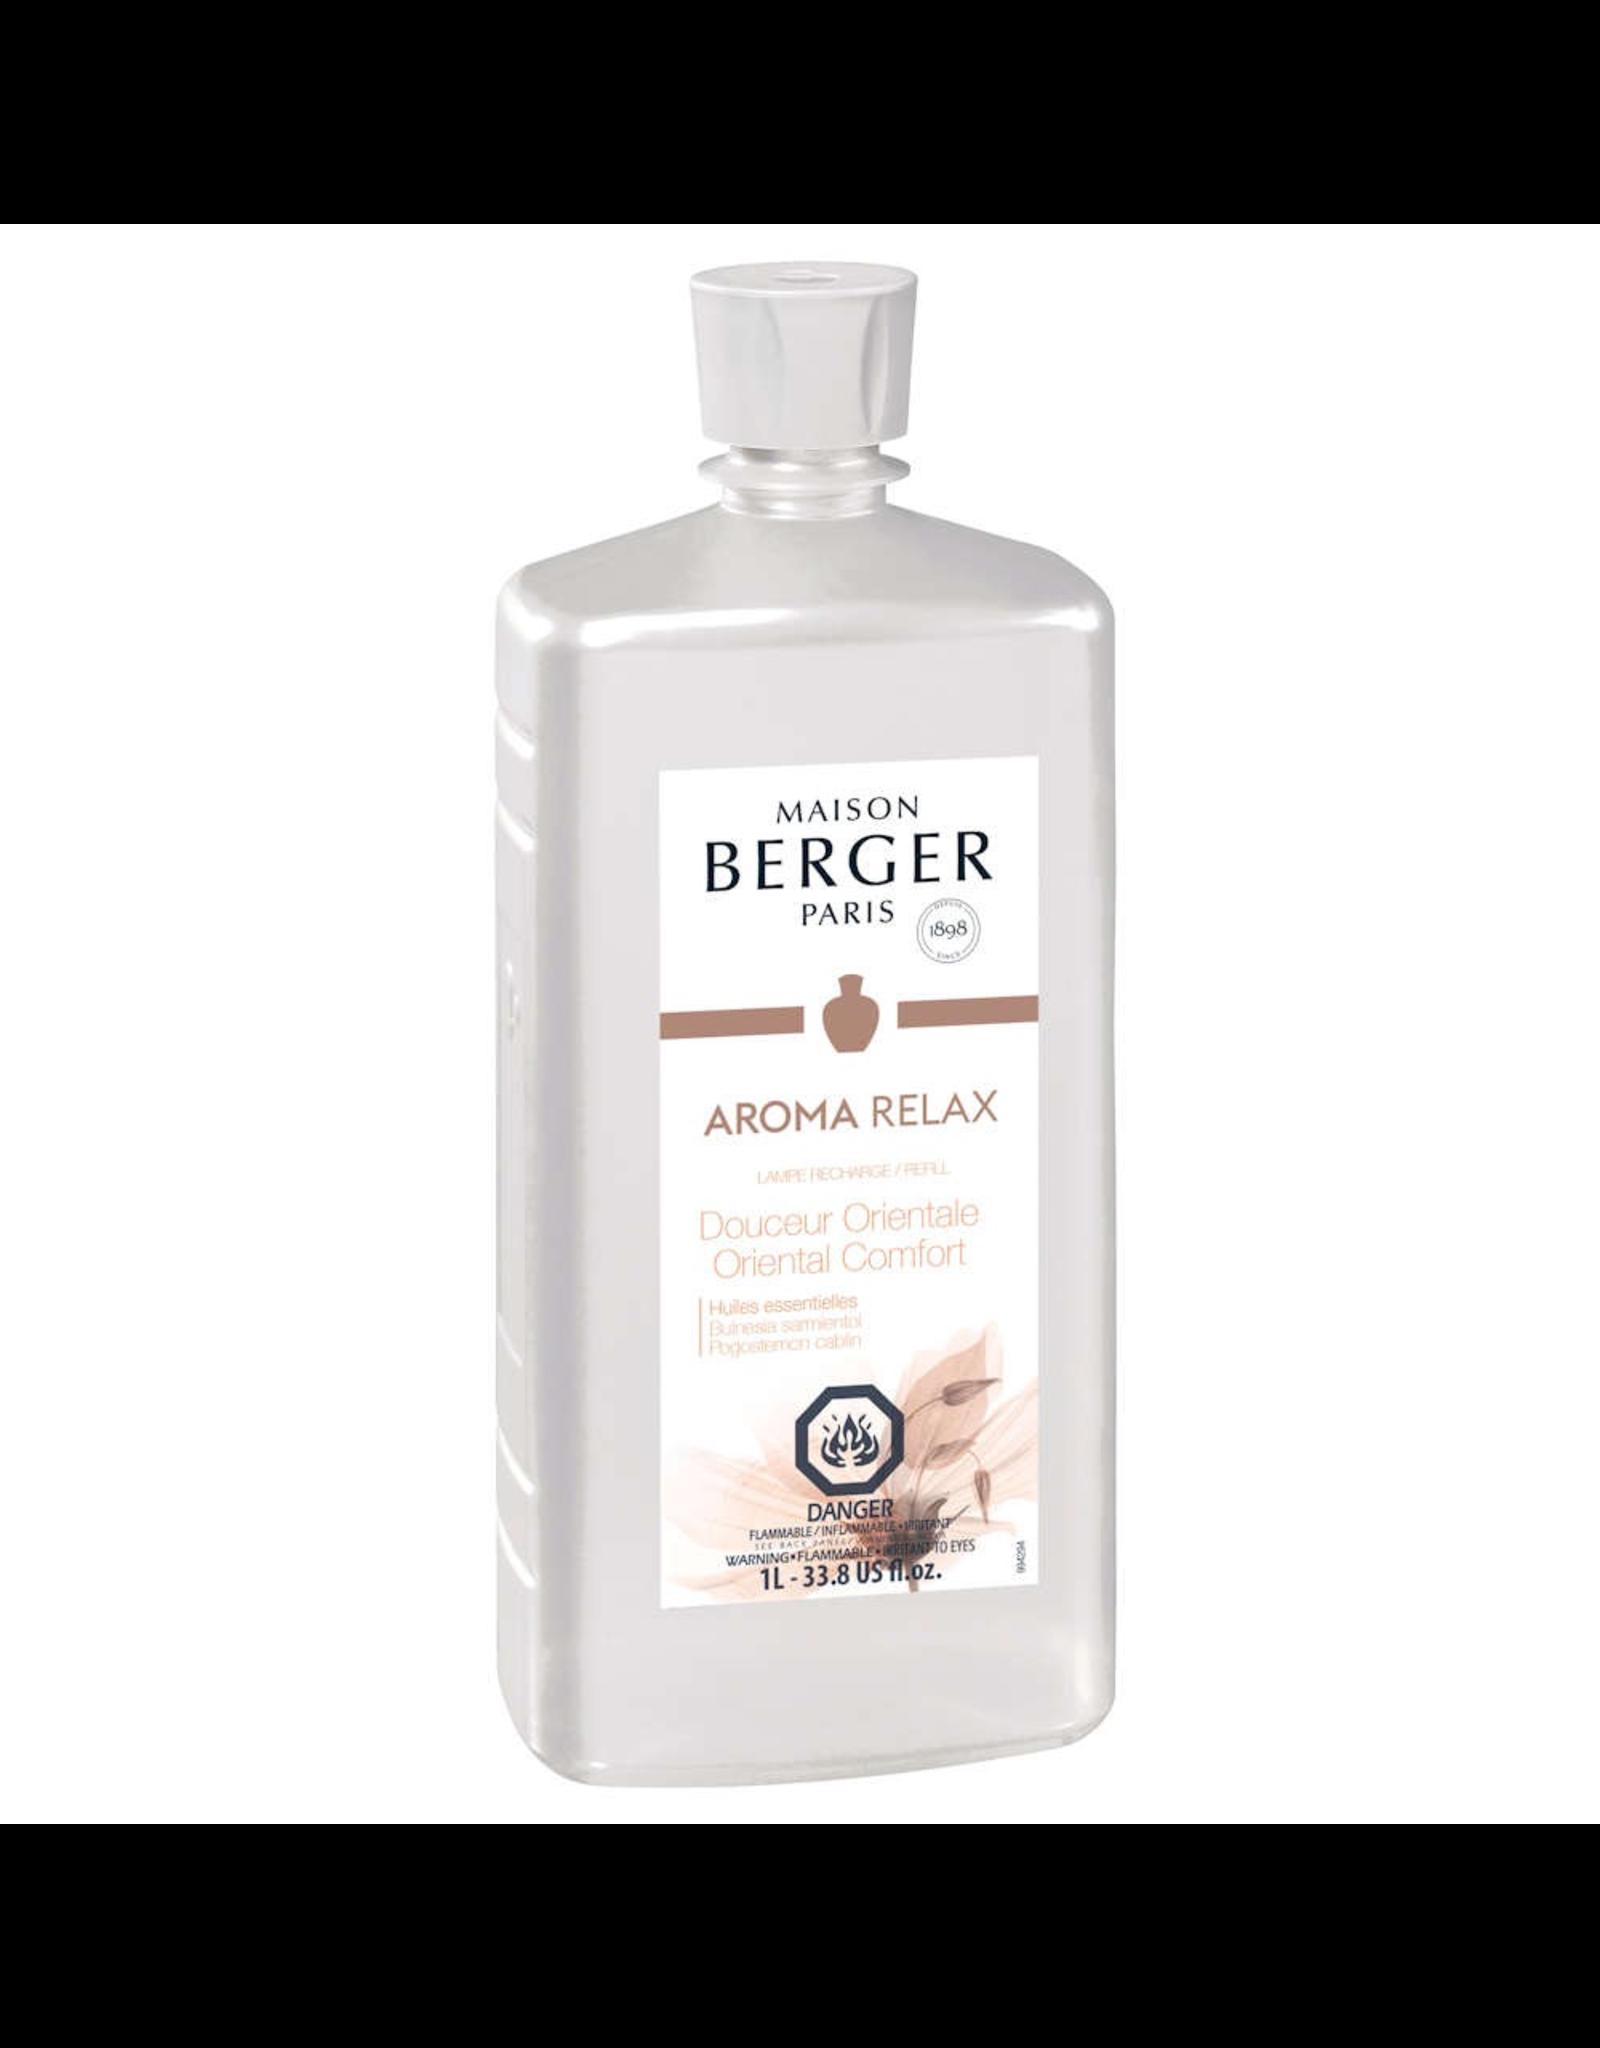 Maison Berger Aroma Relax 500 ml